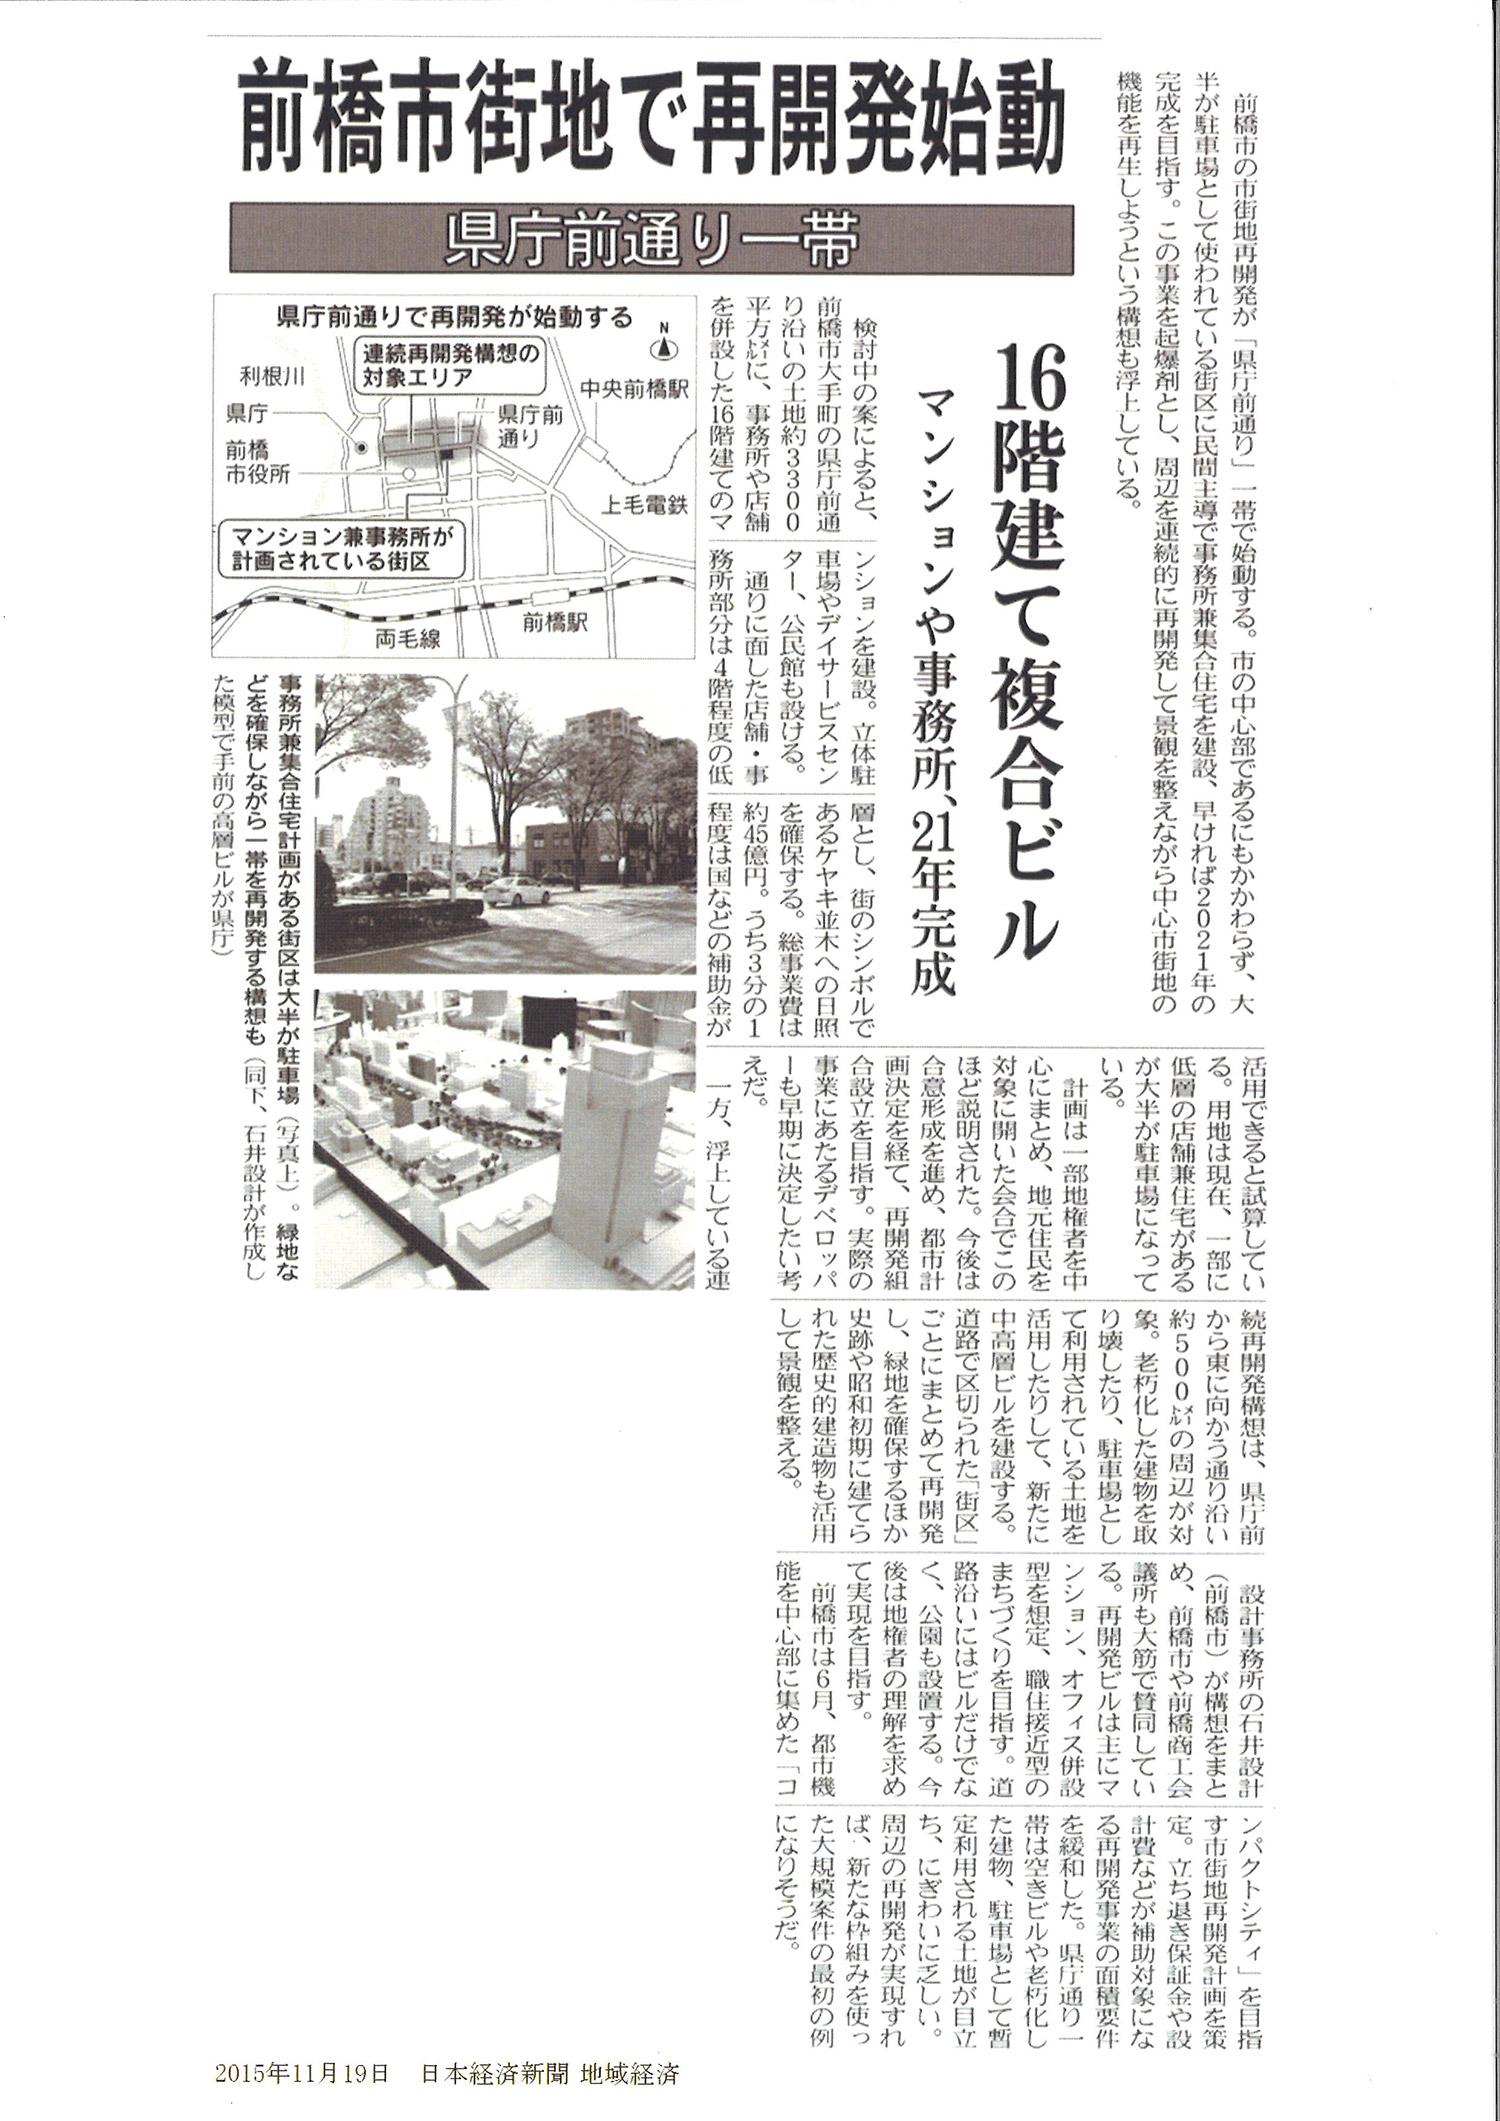 http://www.is-ishii.jp/news/upload/20151119_nikkei-s.jpg